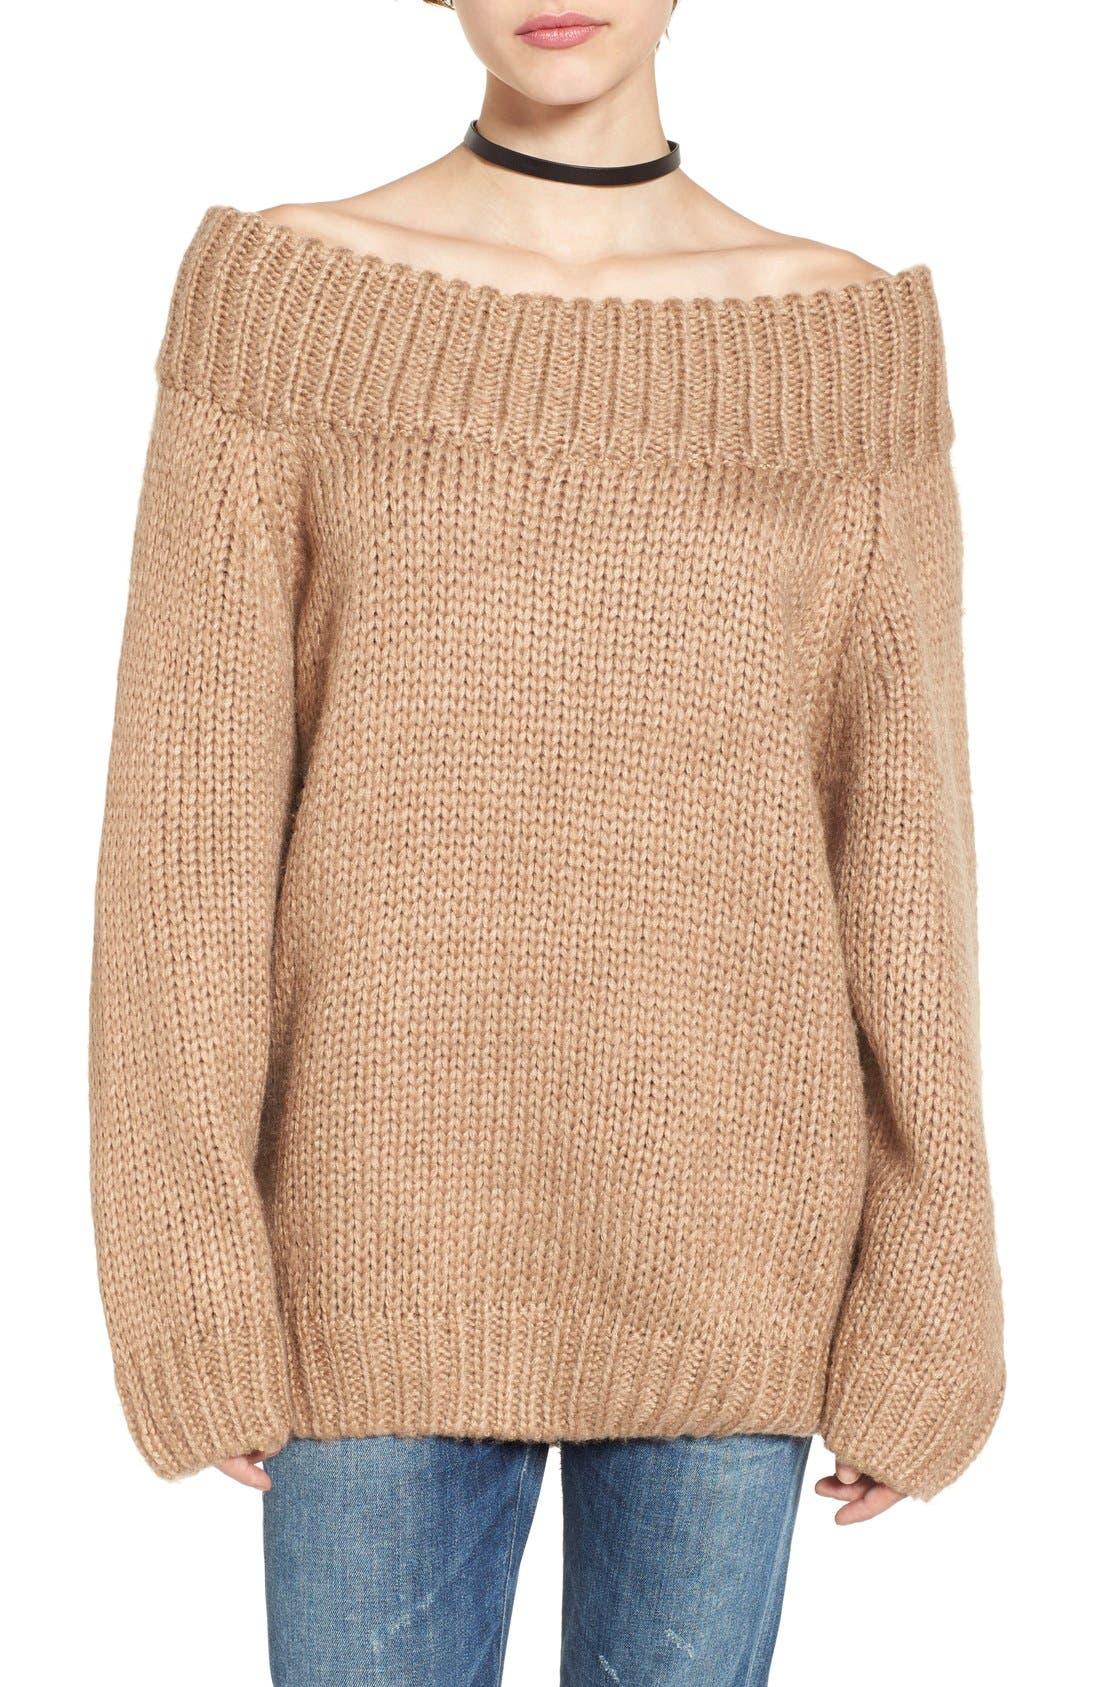 Main Image - Cotton Emporium Off the Shoulder Knit Pullover